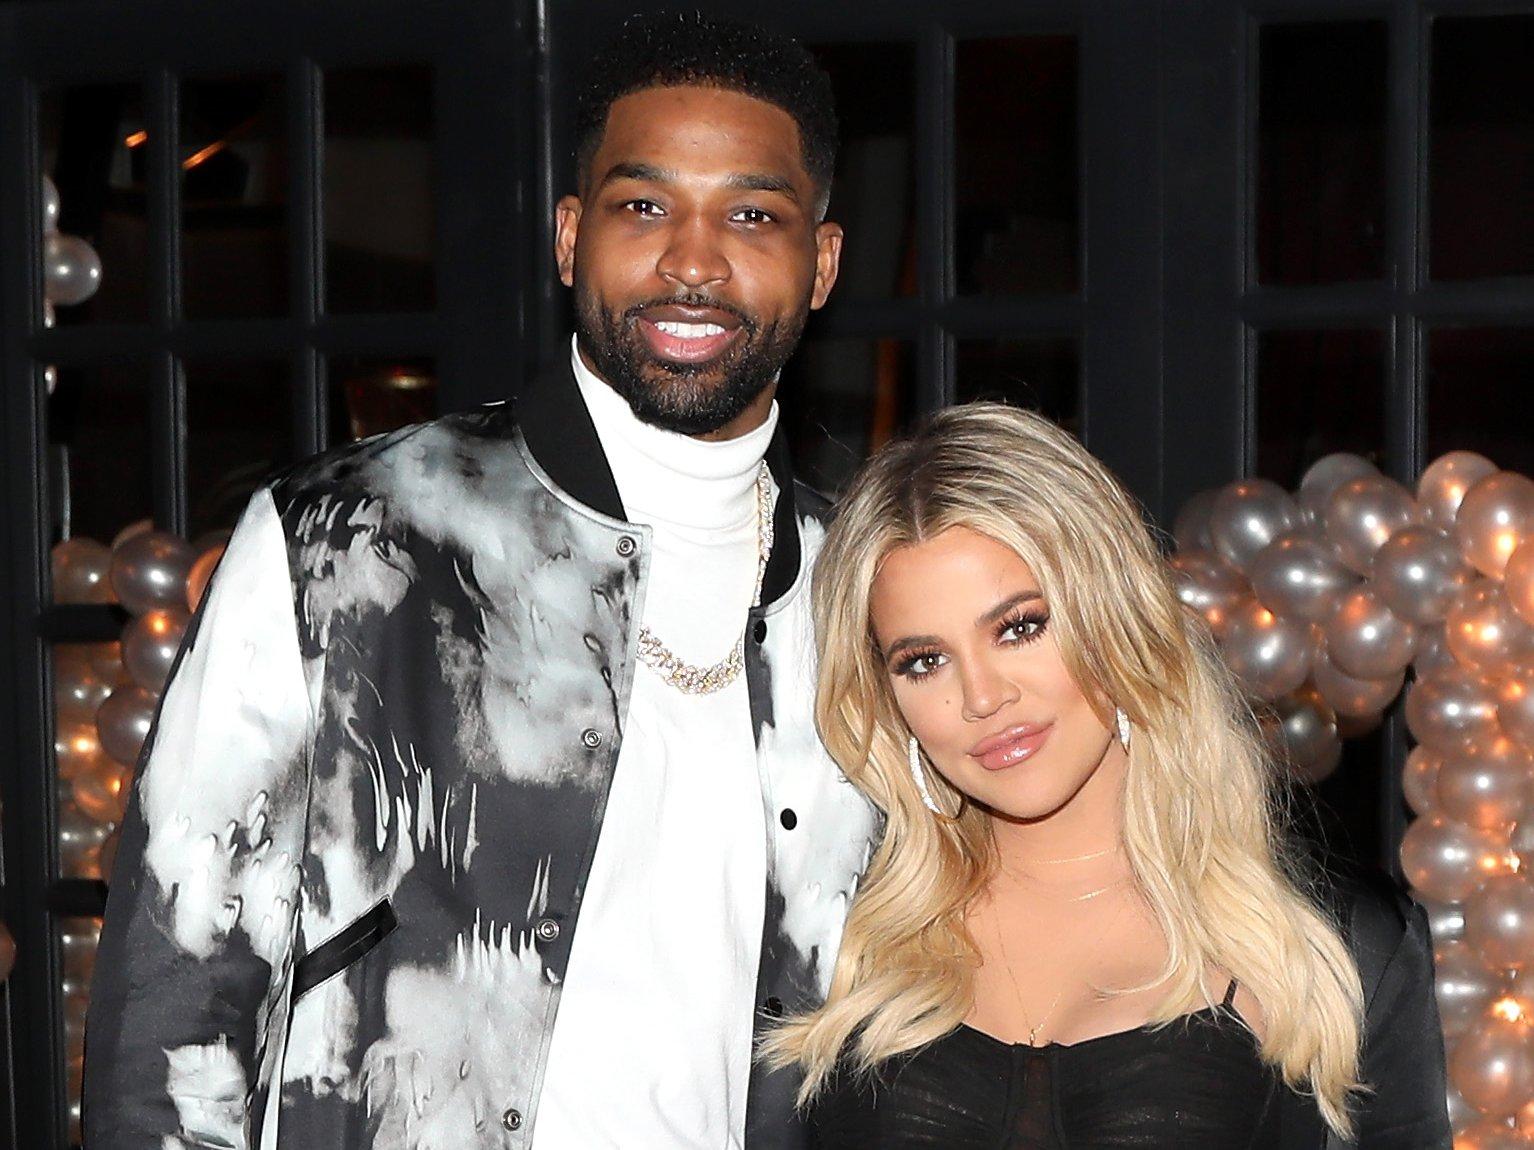 Khloé Kardashian Removes Ring After Tristan Thompson Cheating Rumors